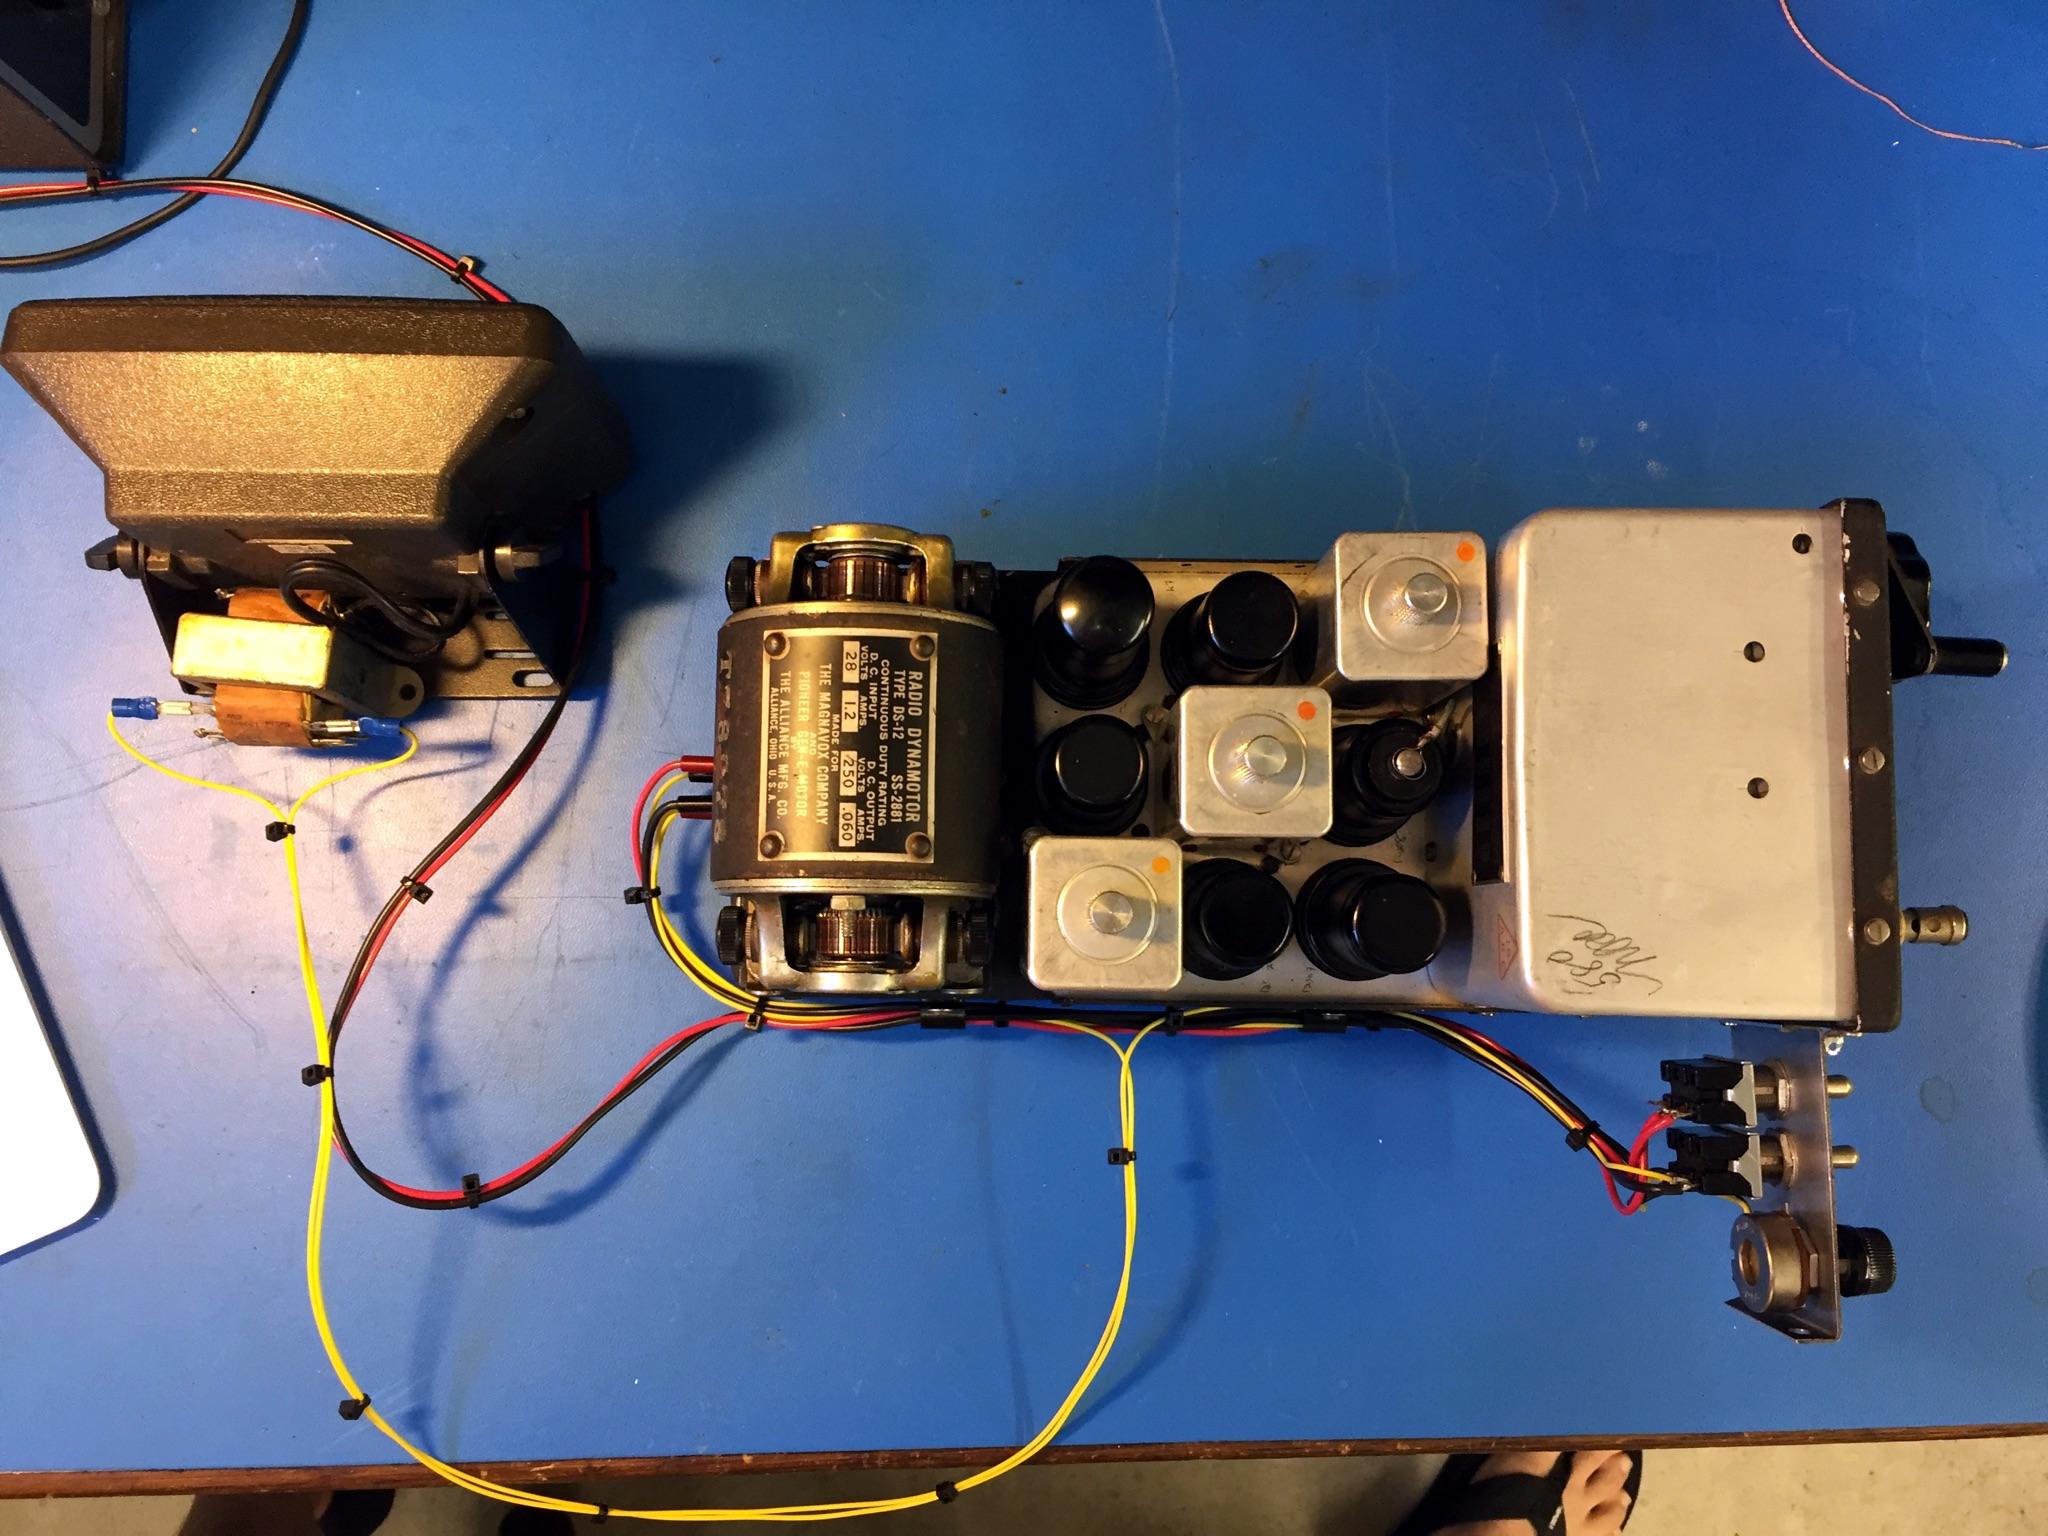 FT-243 MILITARY RADIO HAM RADIO CRYSTALS